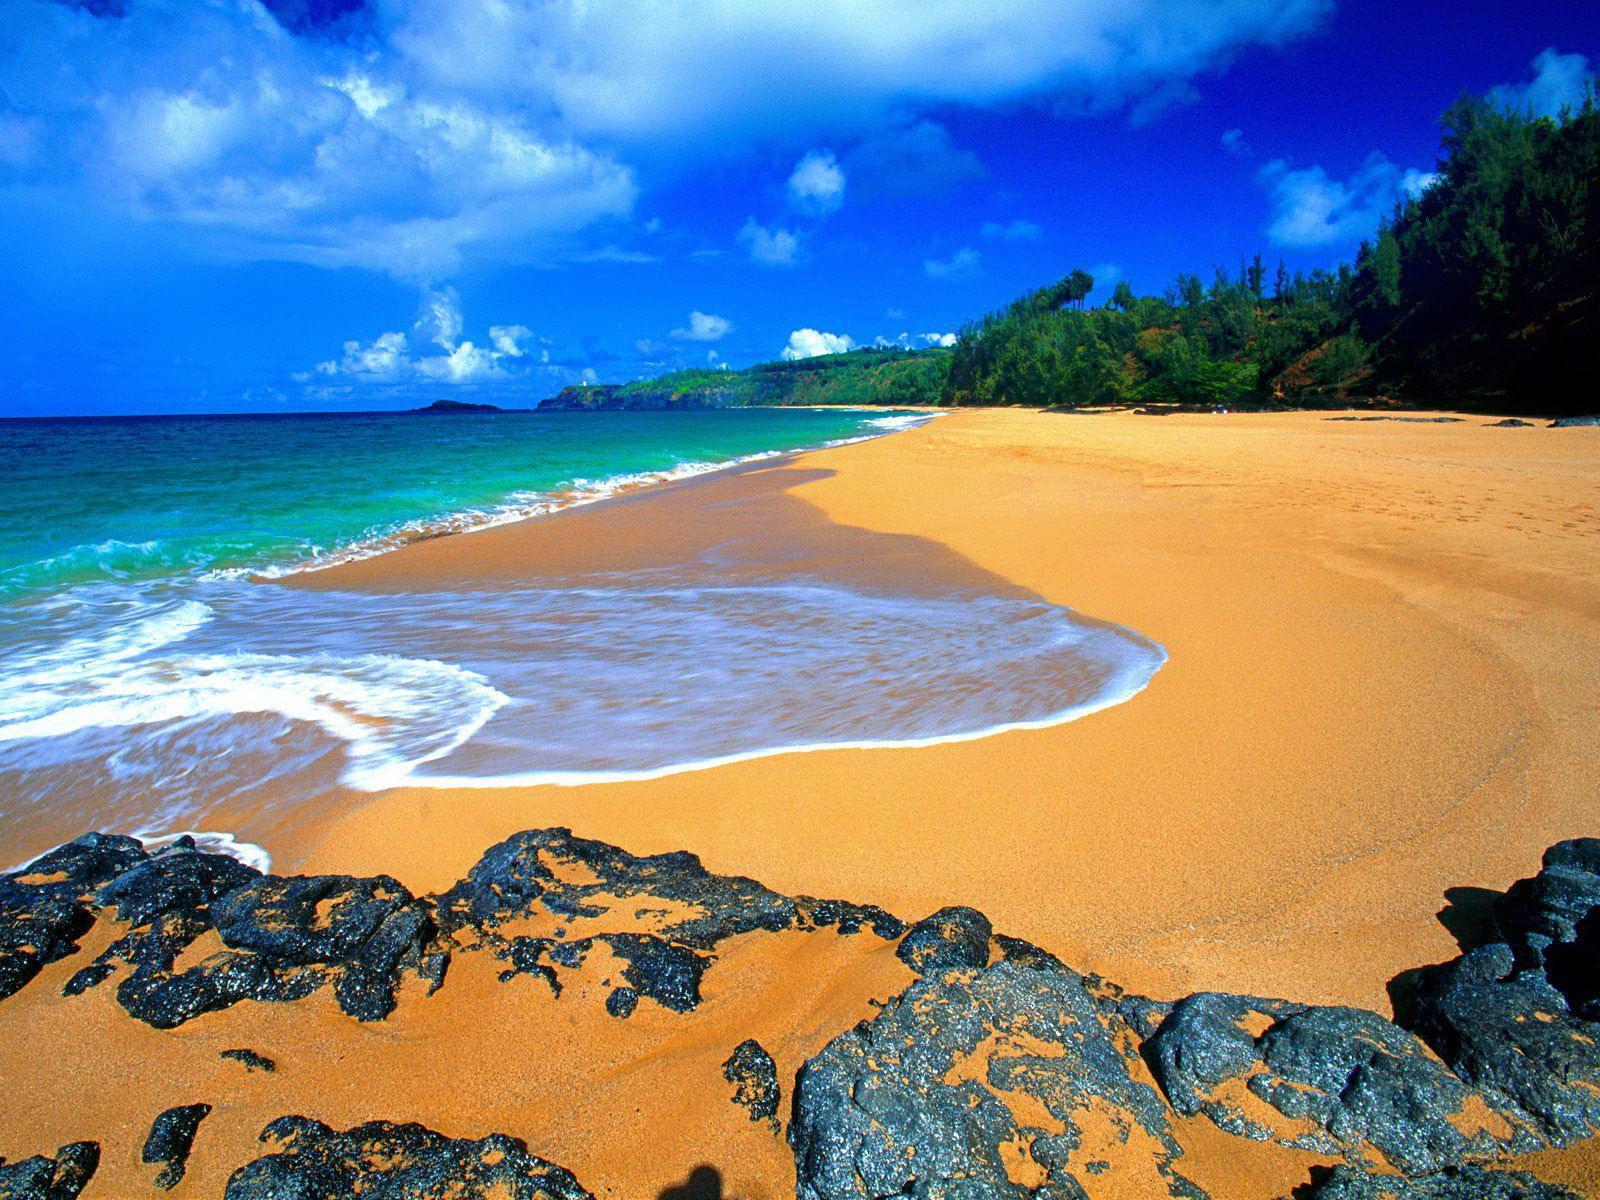 beach pictures hawaii beach pictures hawaii beach pictures hawaii ...